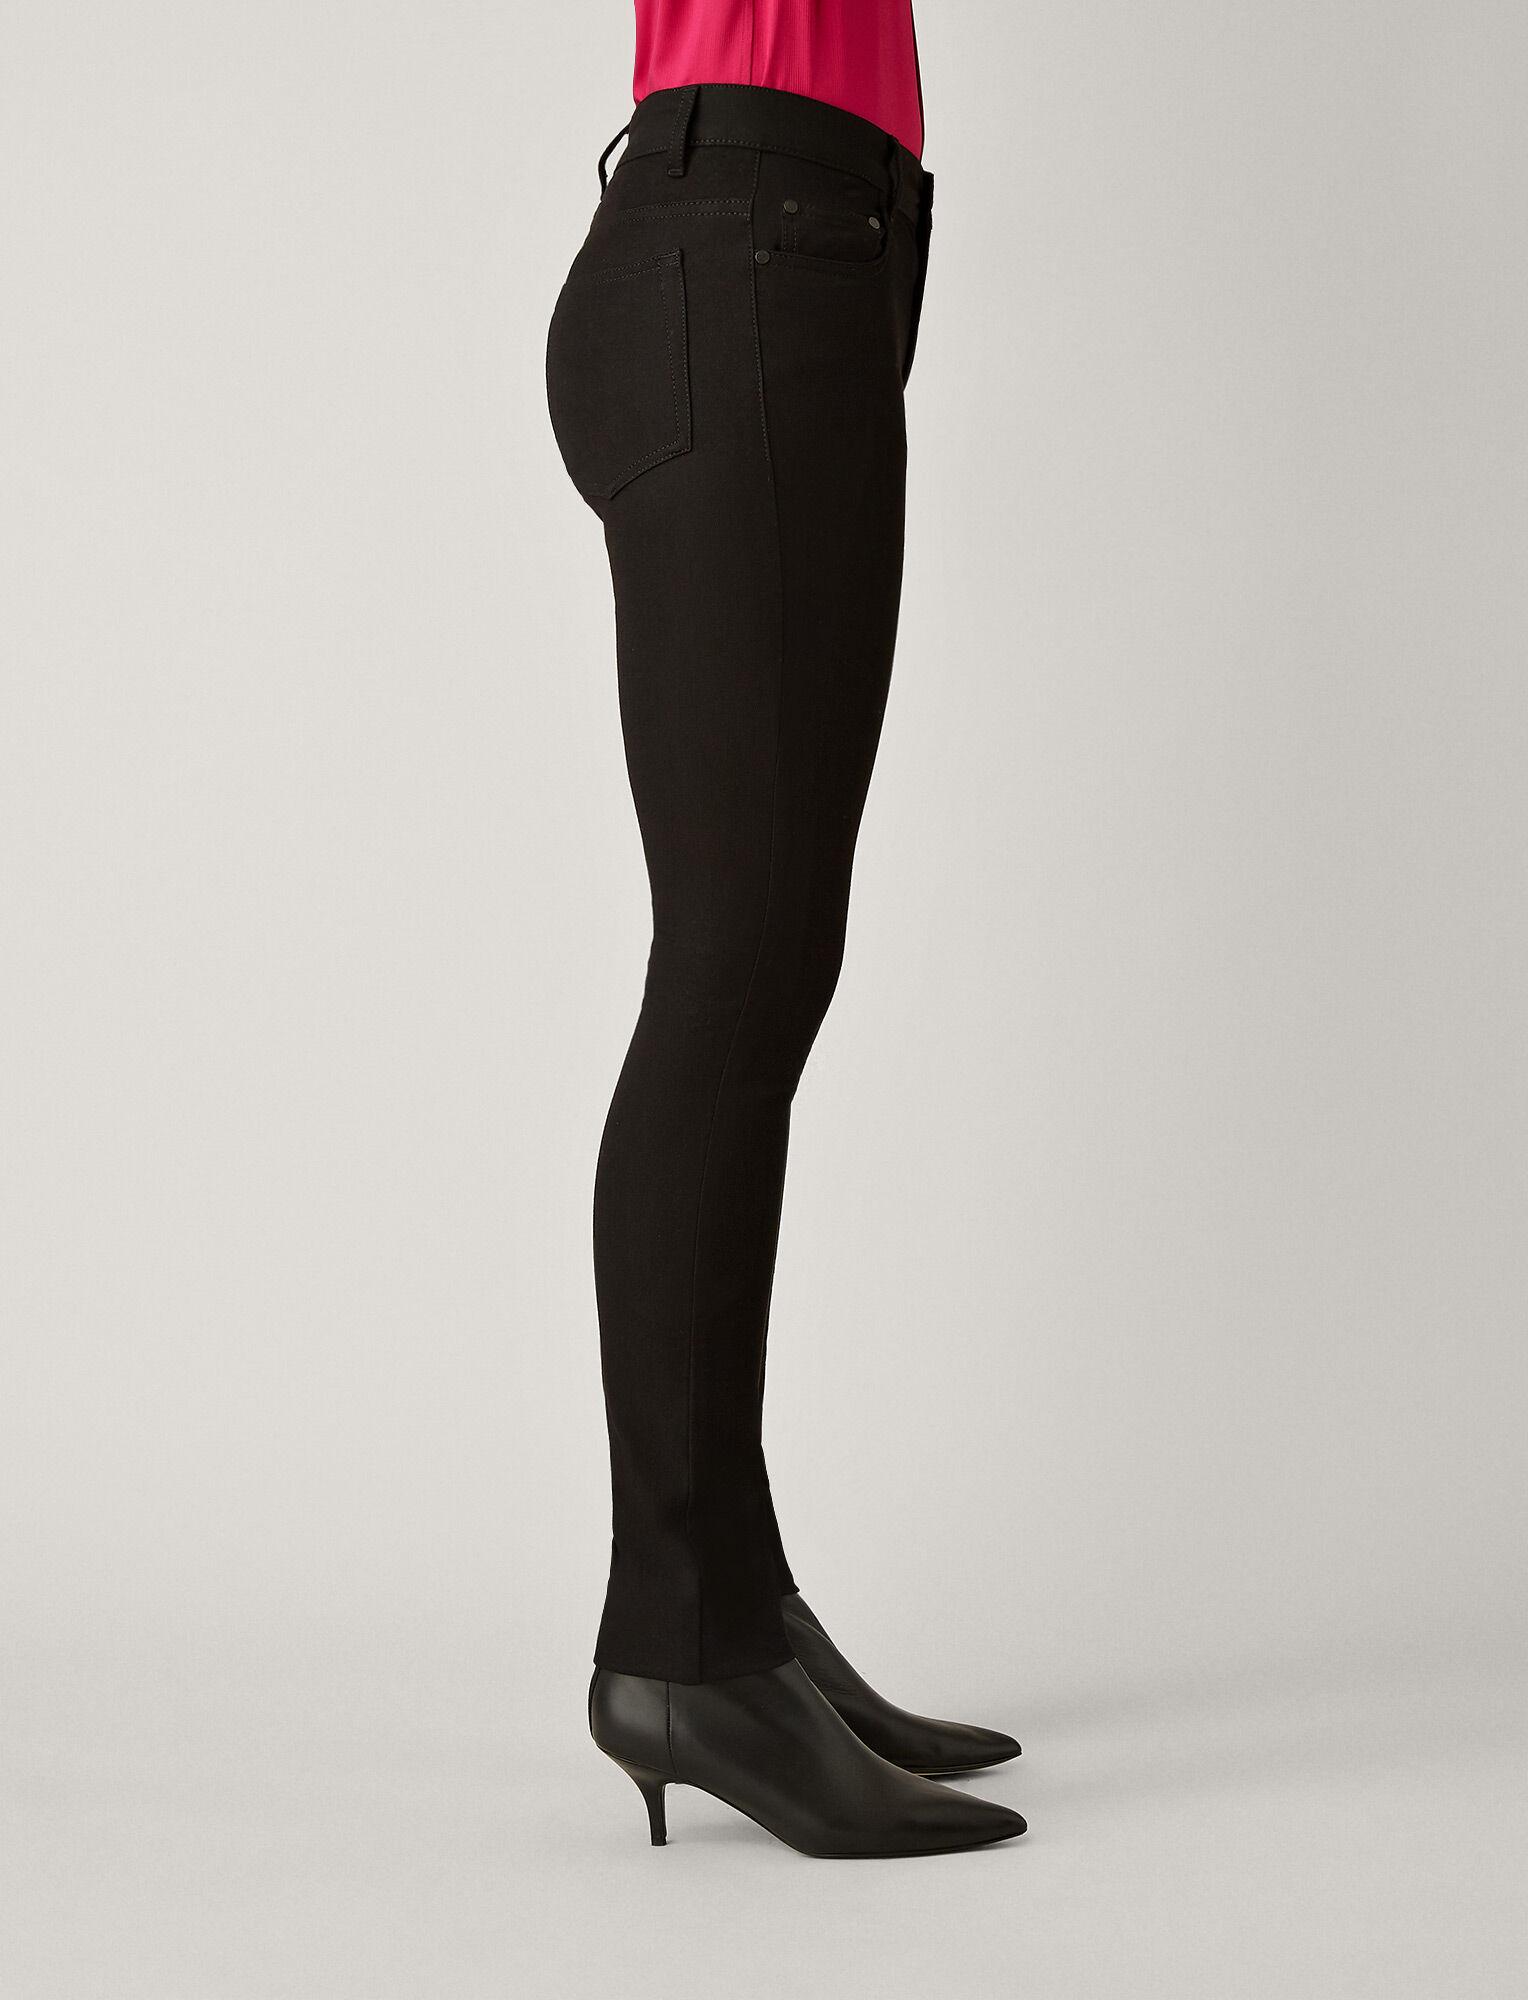 Joseph, Cloud Gabardine Stretch Trousers, in BLACK